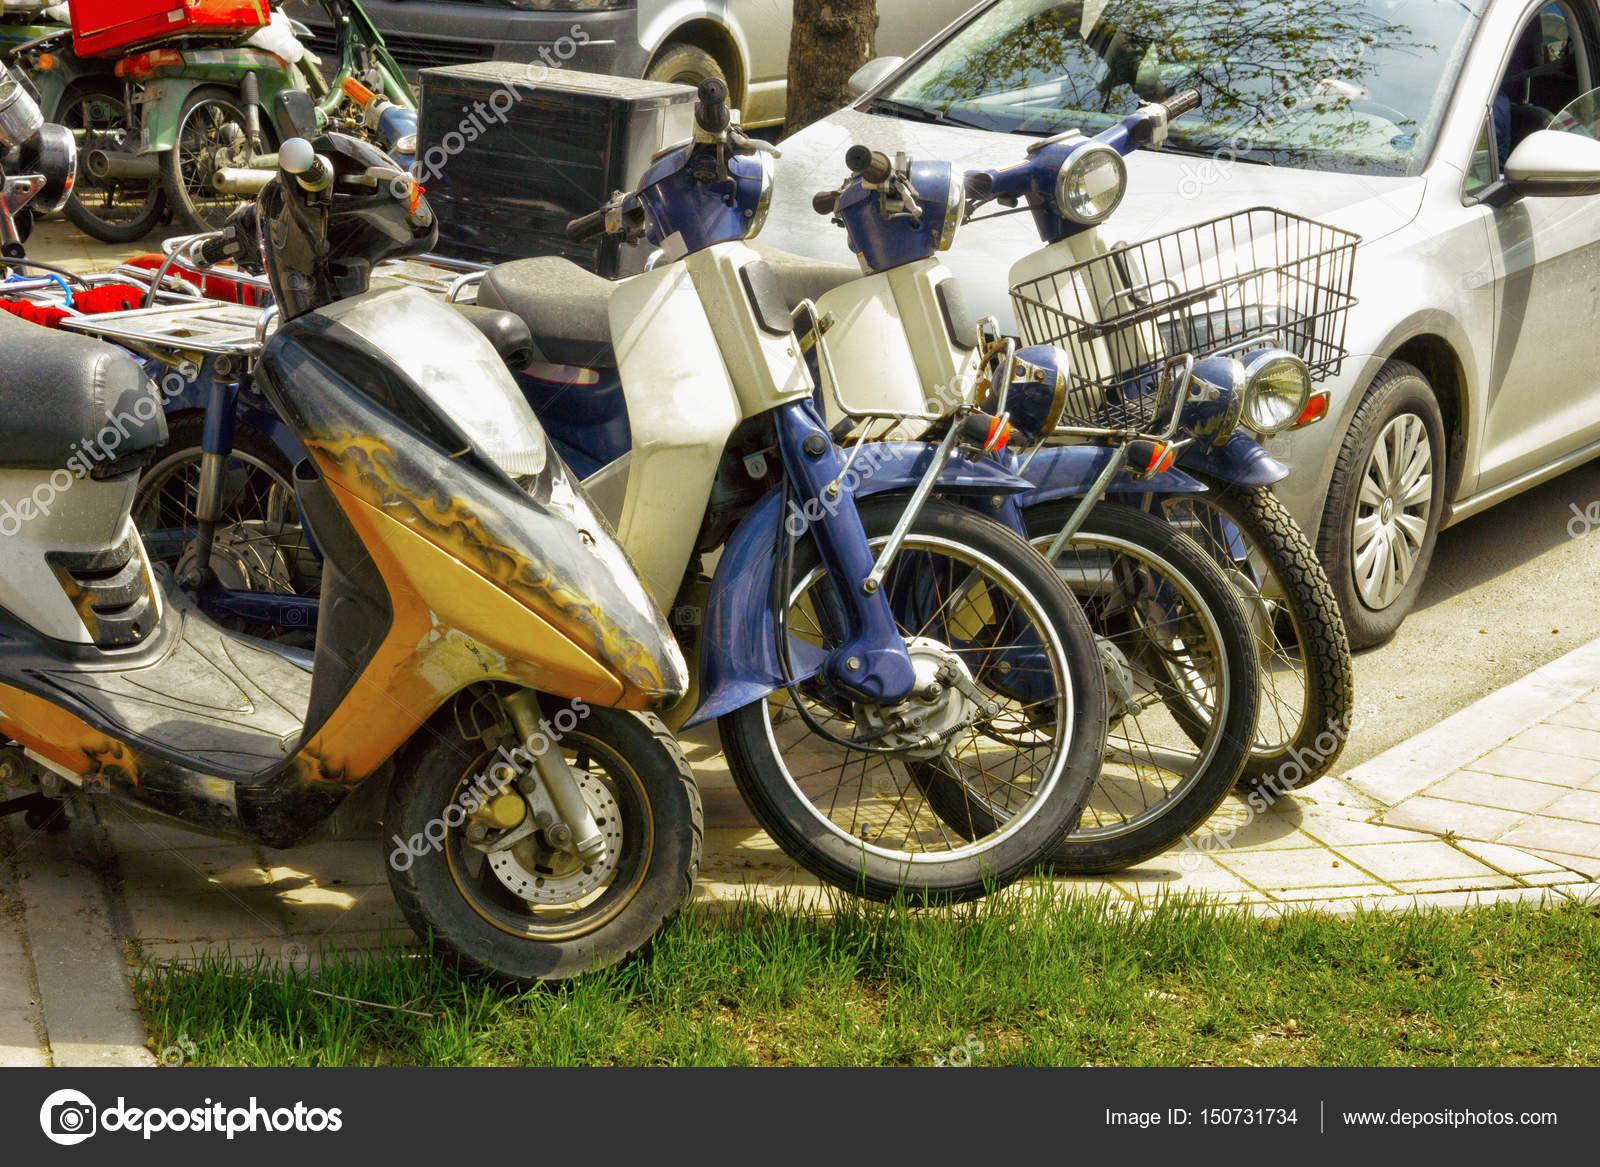 Alte Mopeds Und Motorroller Geparkt Stockfoto Bodu10 150731734